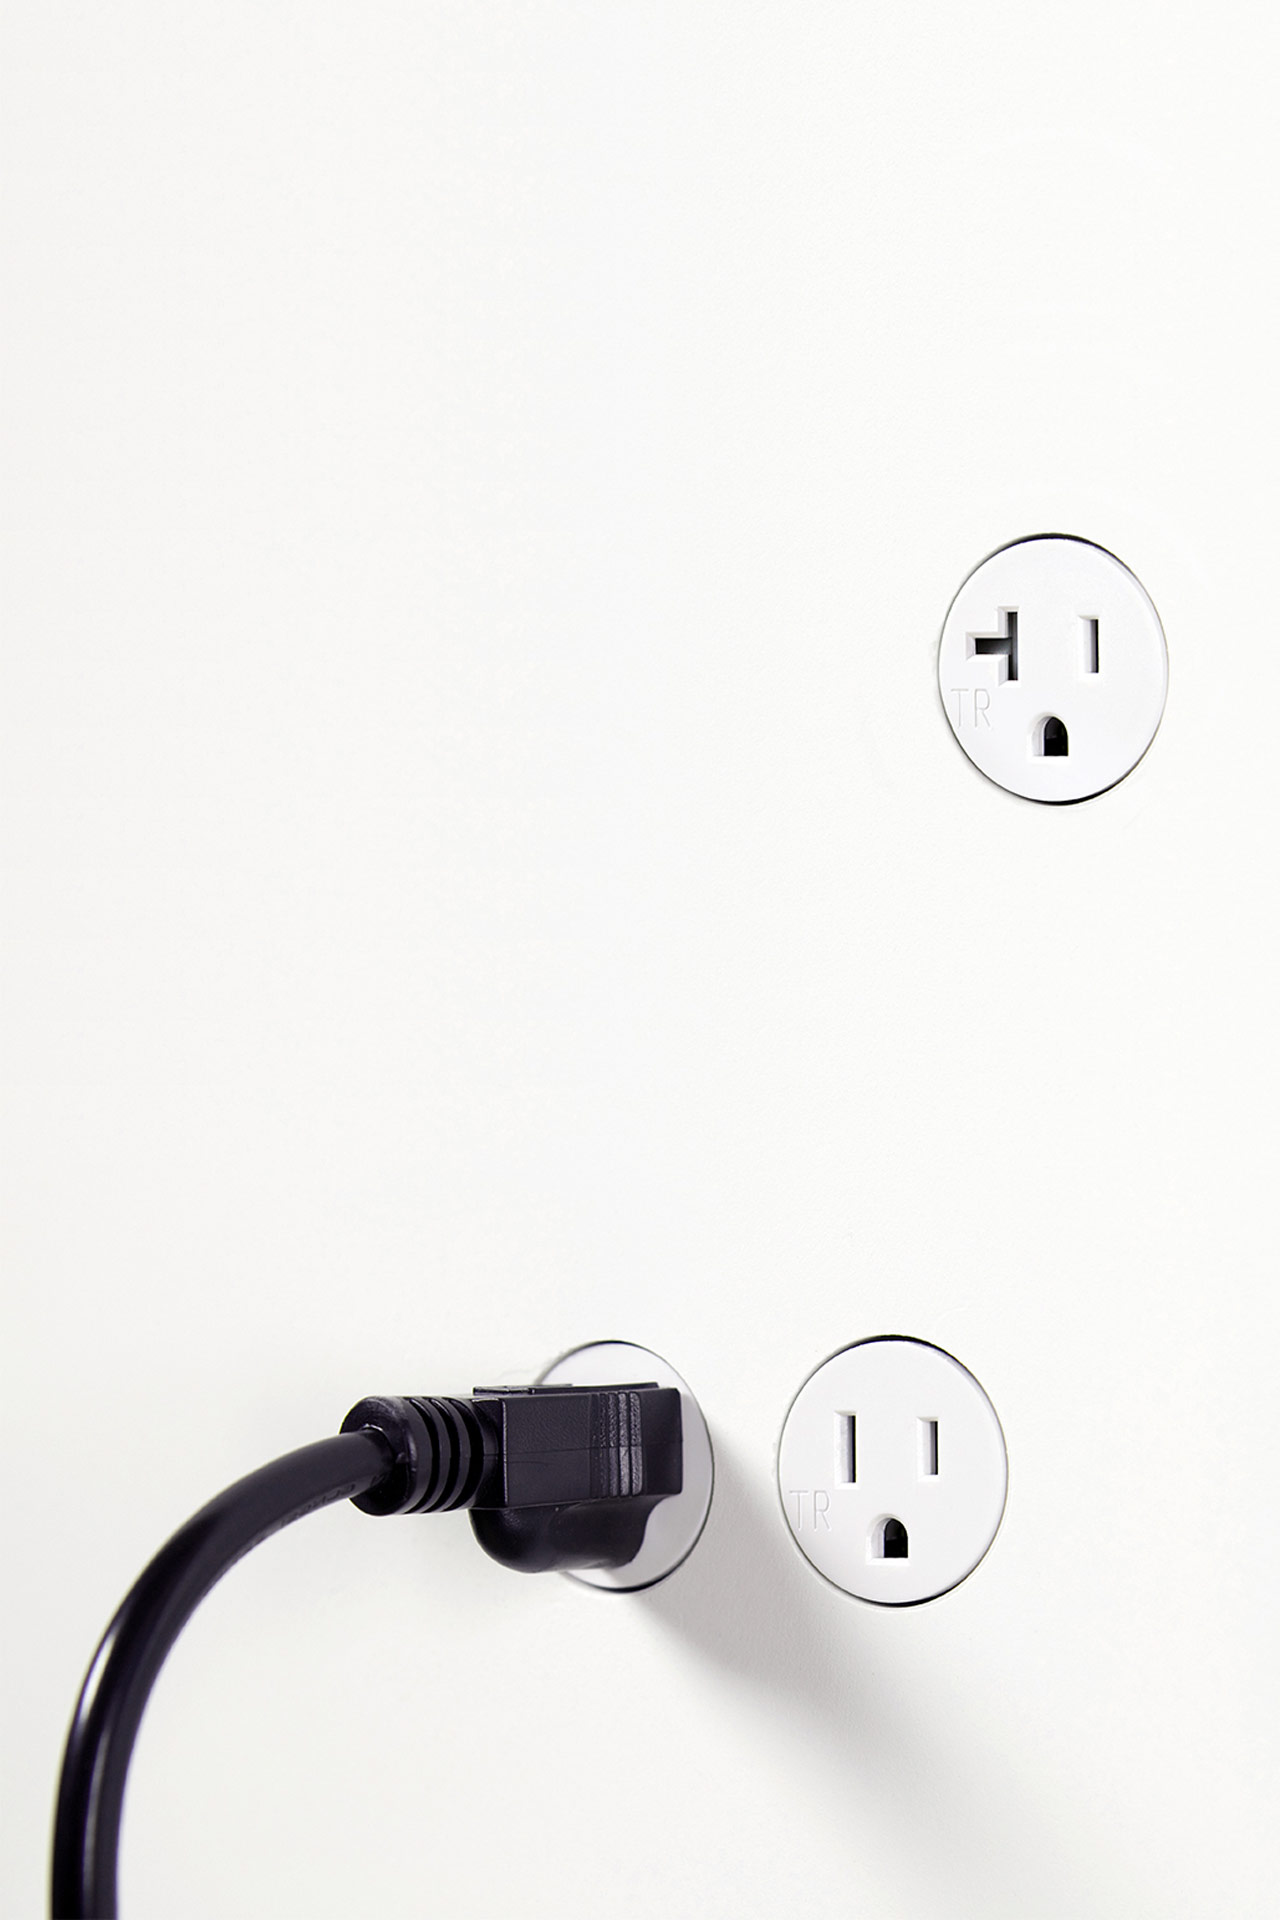 BOCCI22 MINIMALIST ELECTRICAL ACCESS.